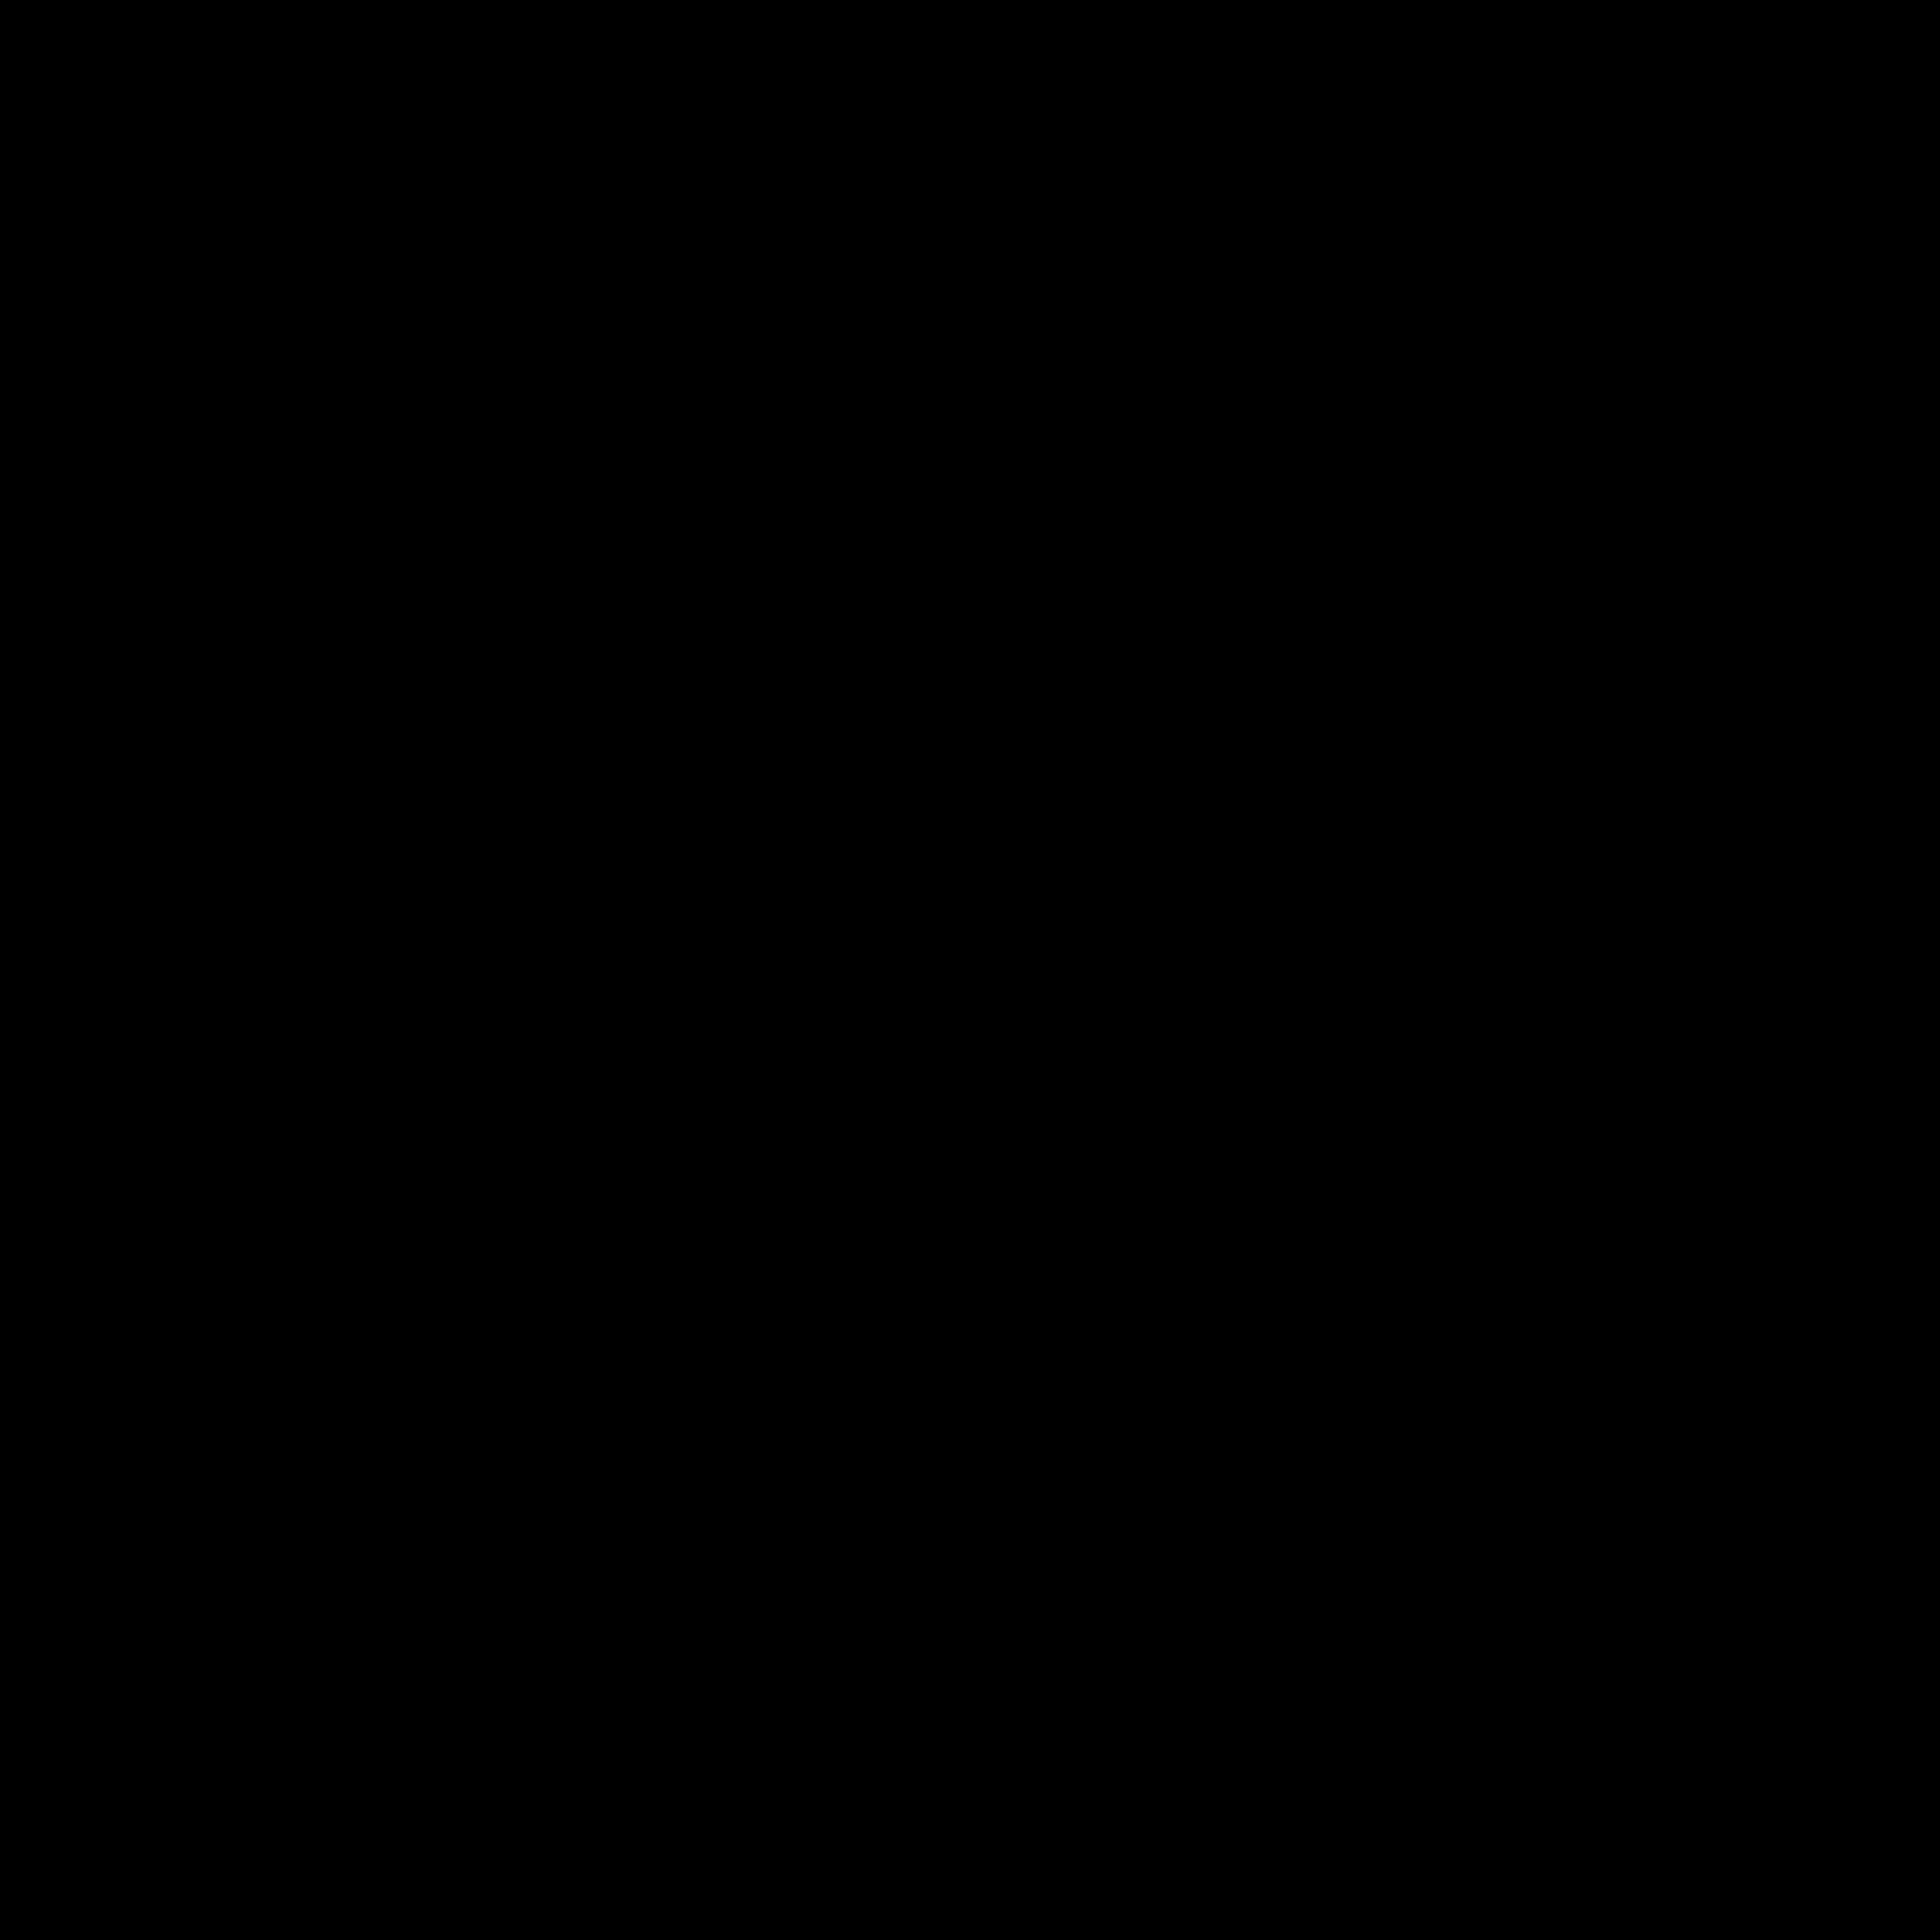 Ingersoll Rand Logo PNG Transparent & SVG Vector - Freebie ...